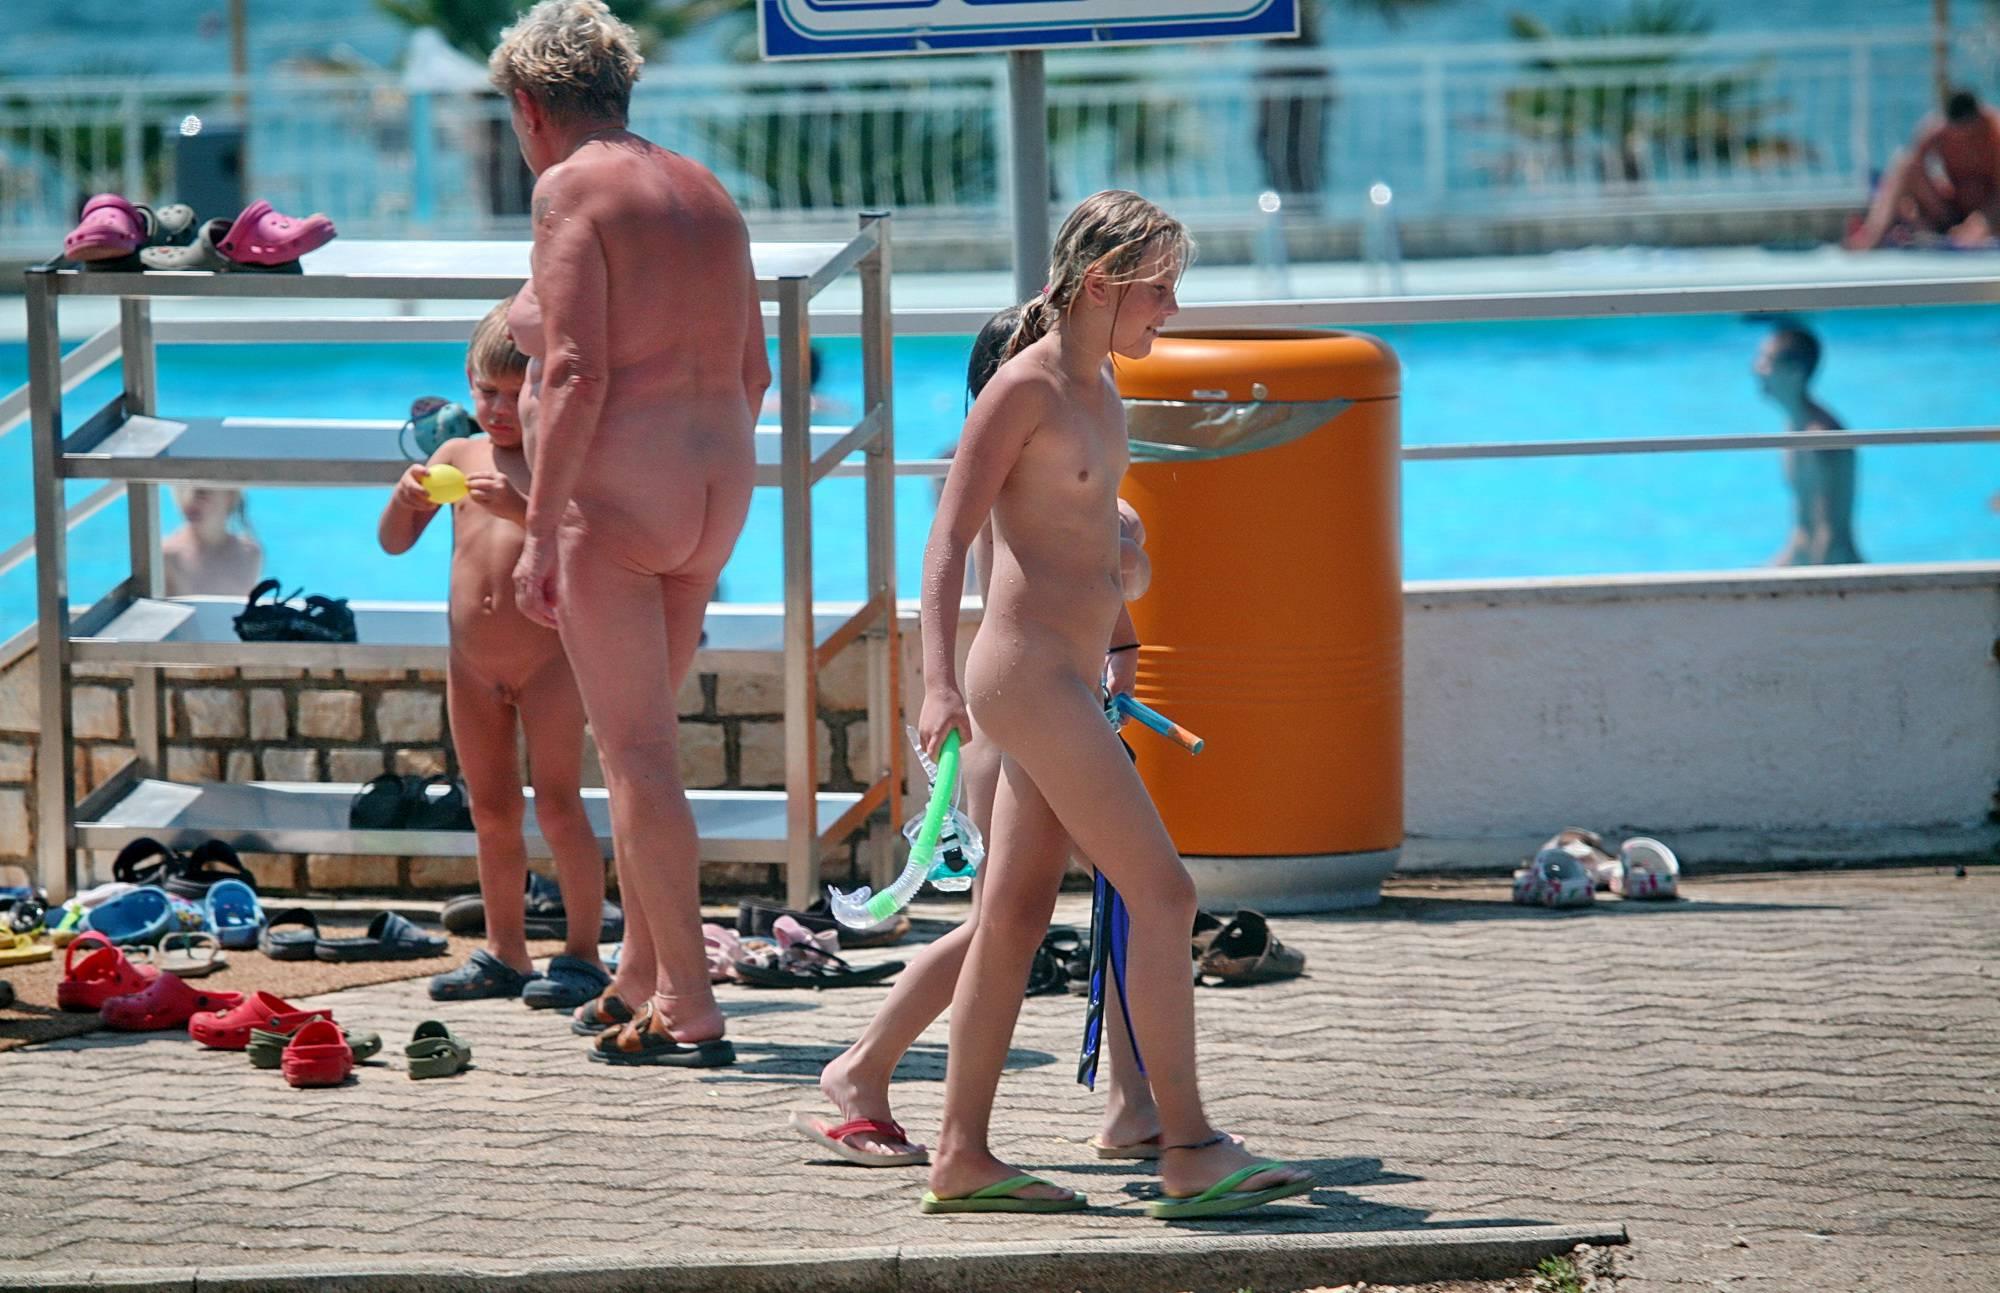 Nudist Photos Gathering Group of Nudes - 1